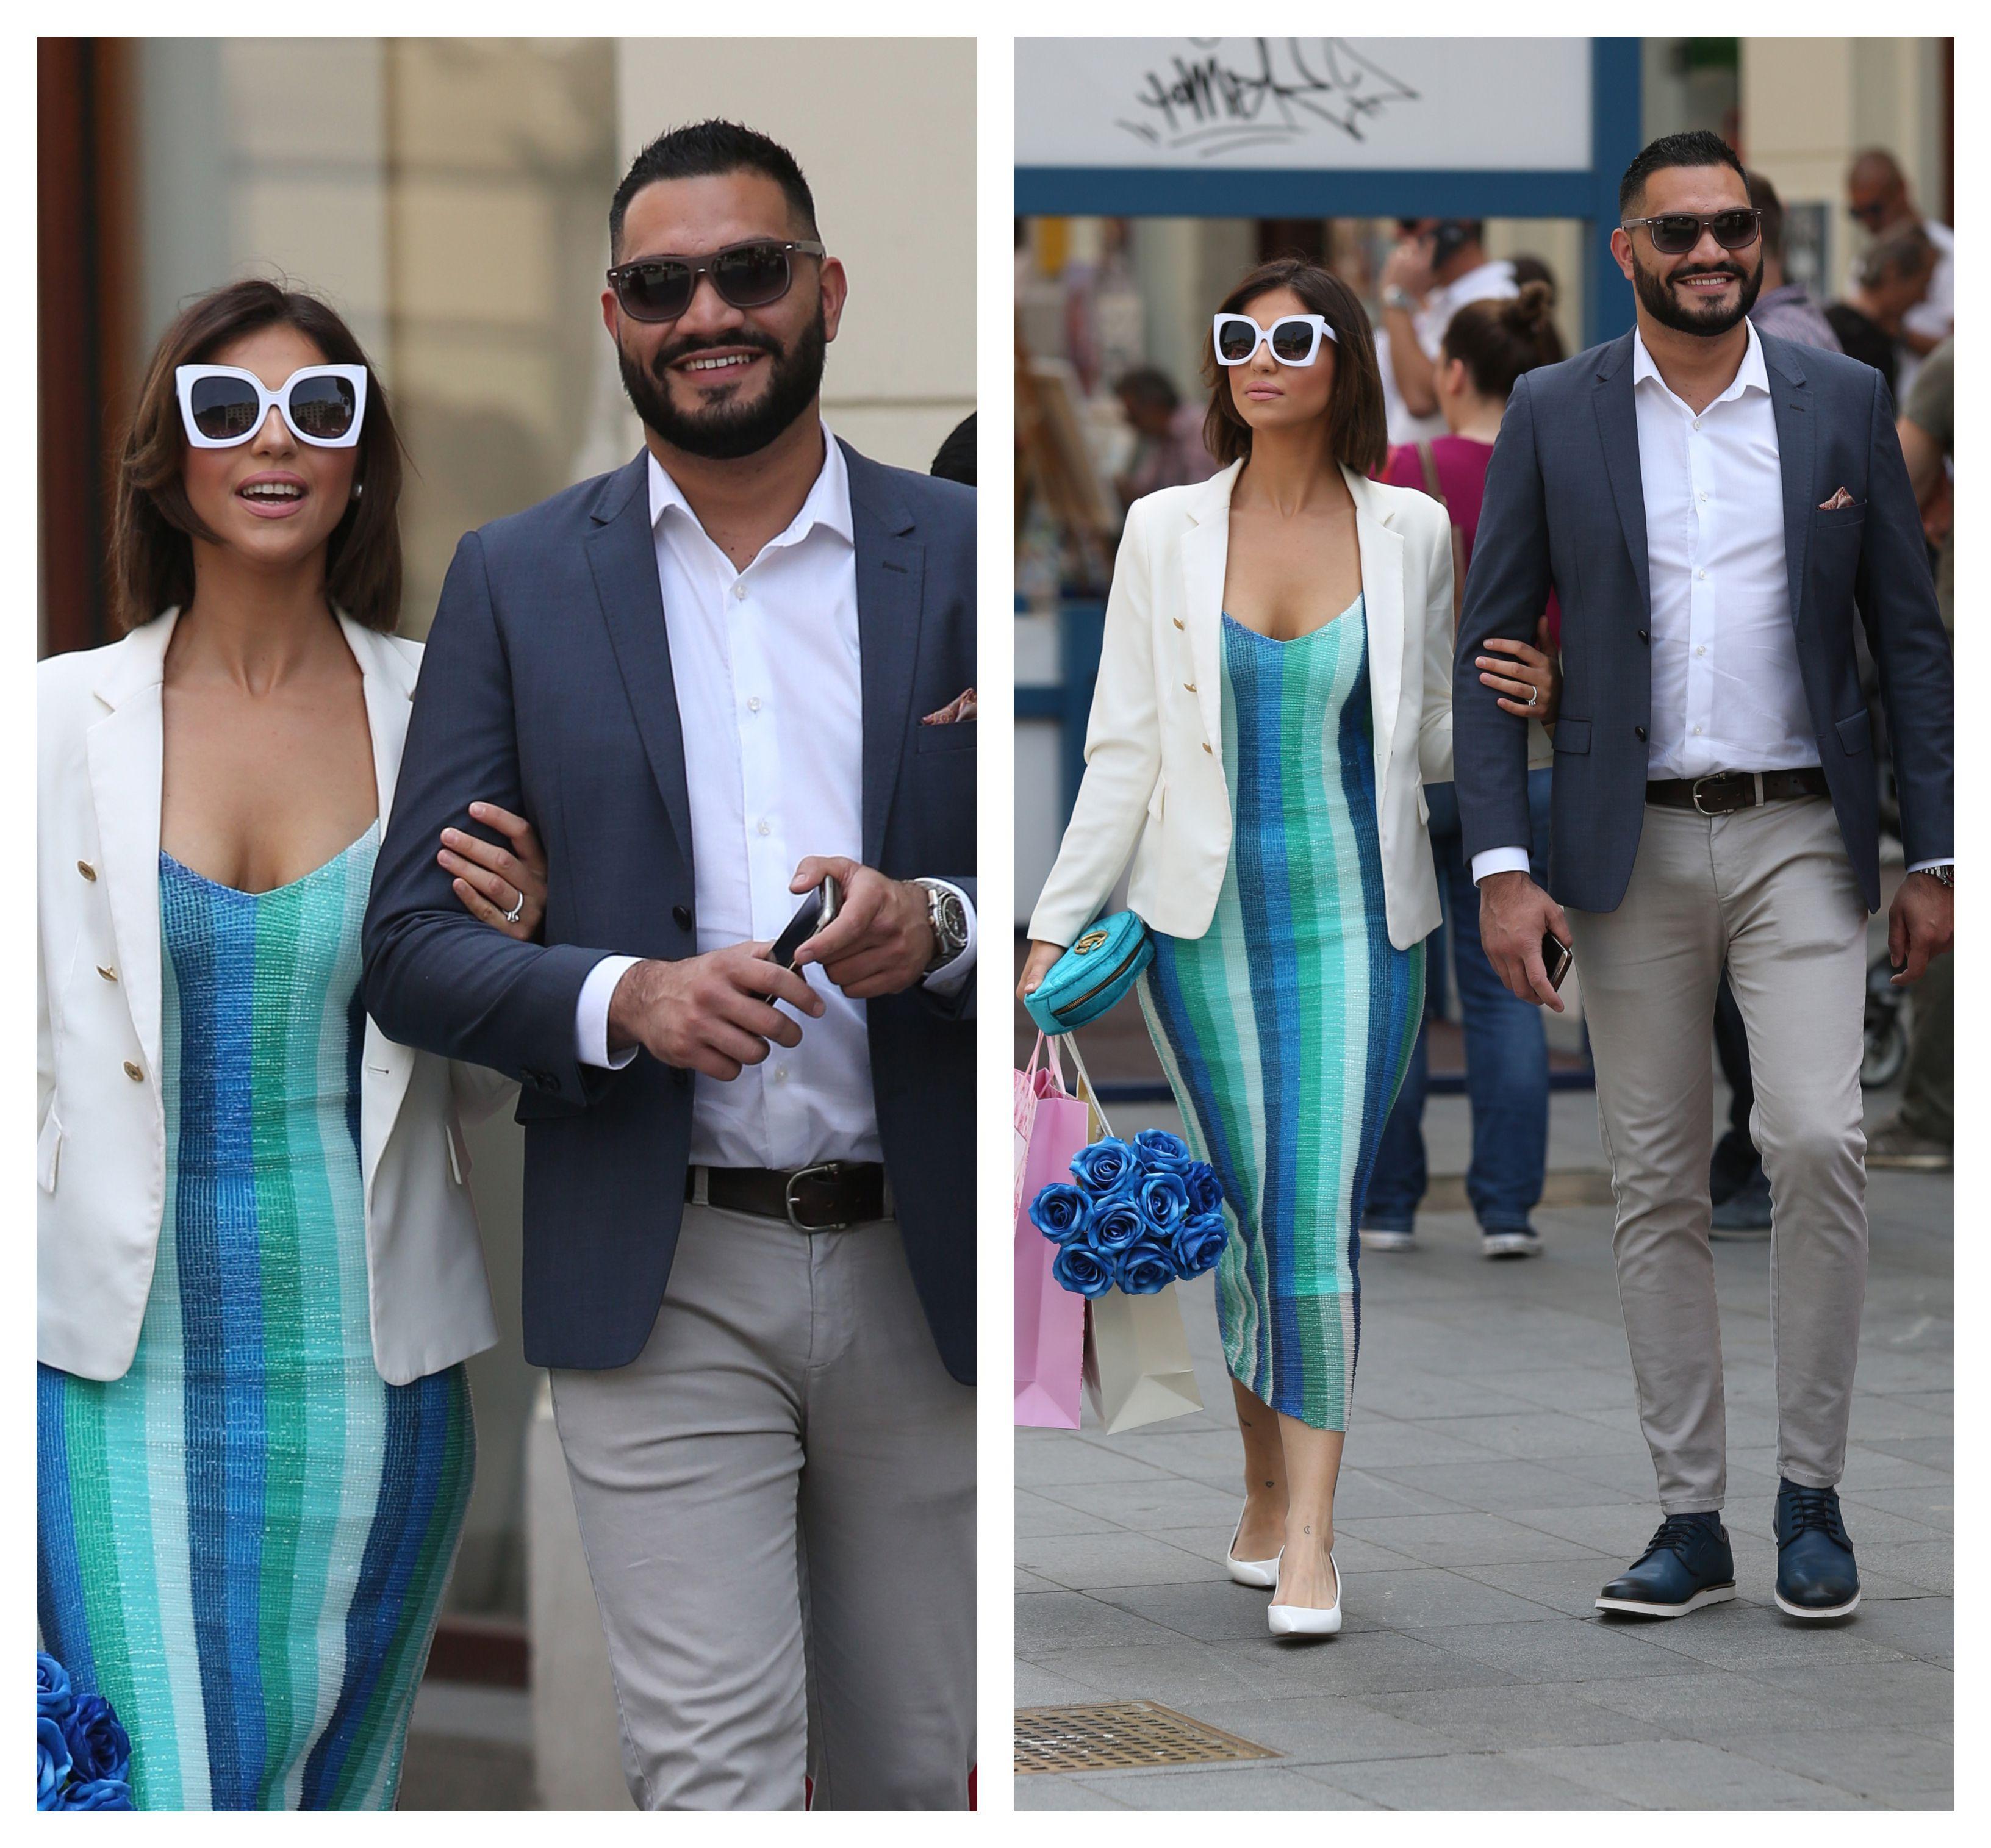 Ovaj zgodni par sa zagrebačke špice kao da je sišao s naslovnice modnog časopisa